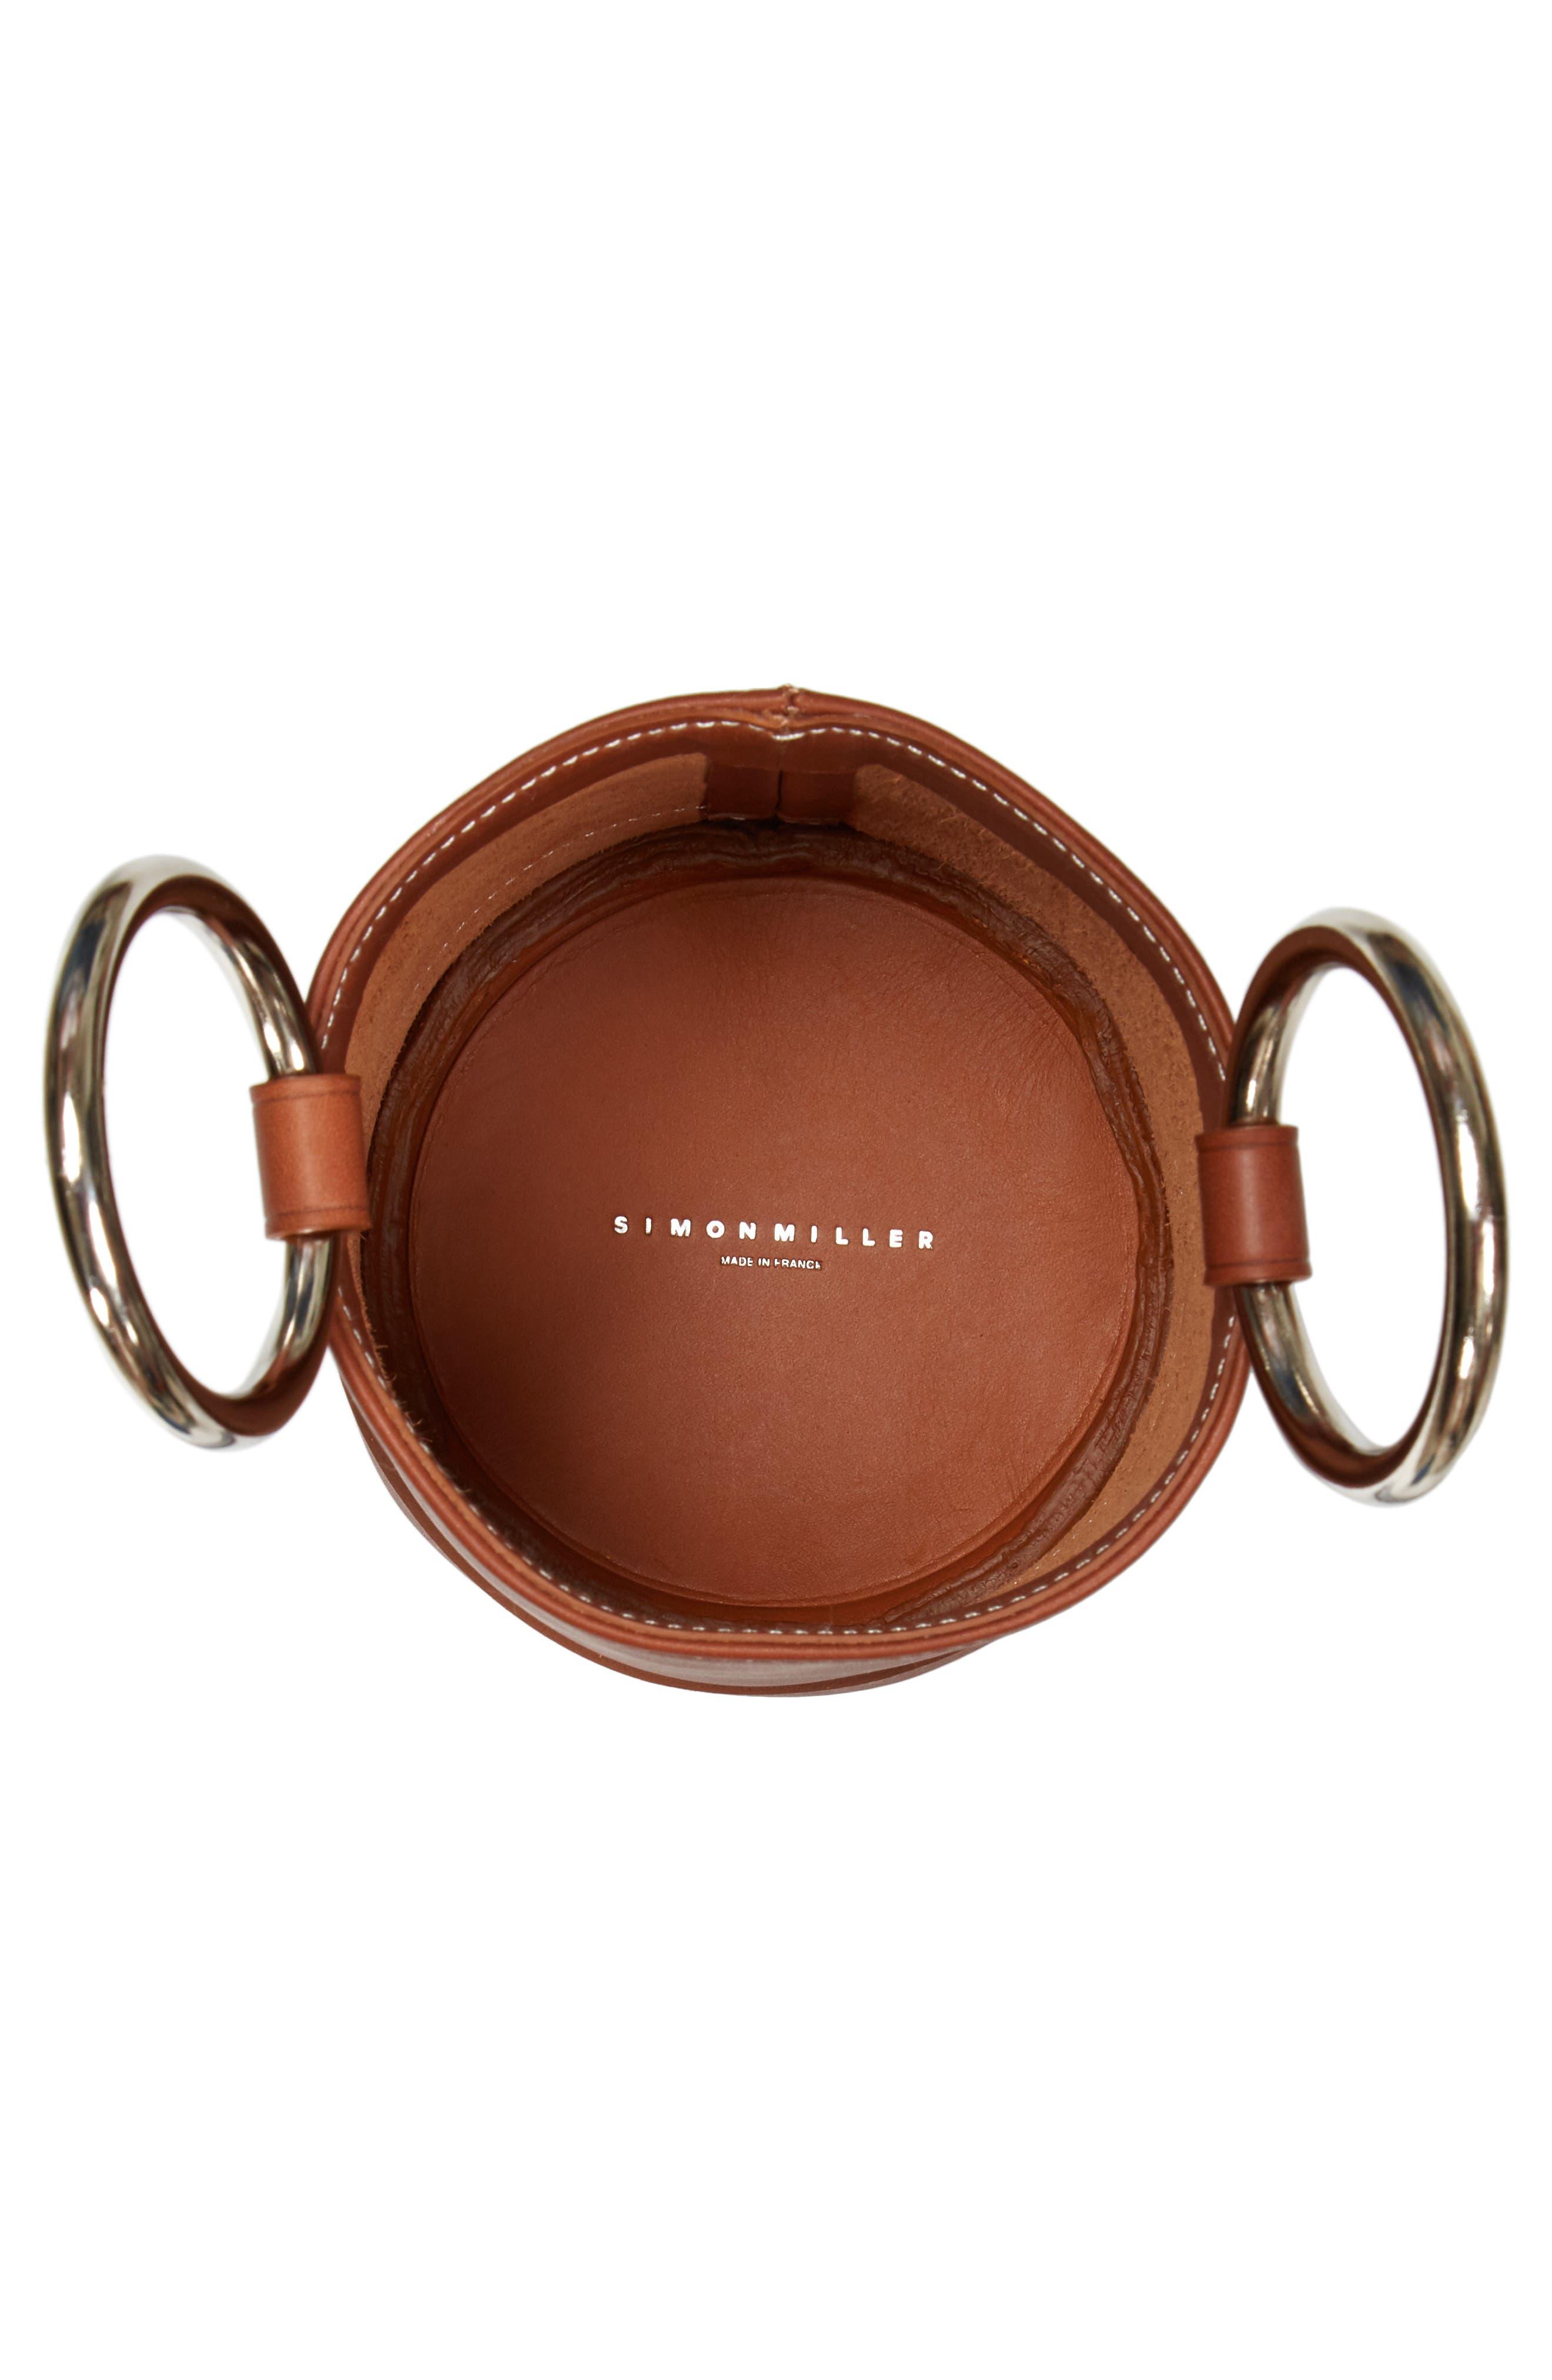 Bonsai 15 Calfskin Leather Bucket Bag,                             Alternate thumbnail 4, color,                             DARK TAN